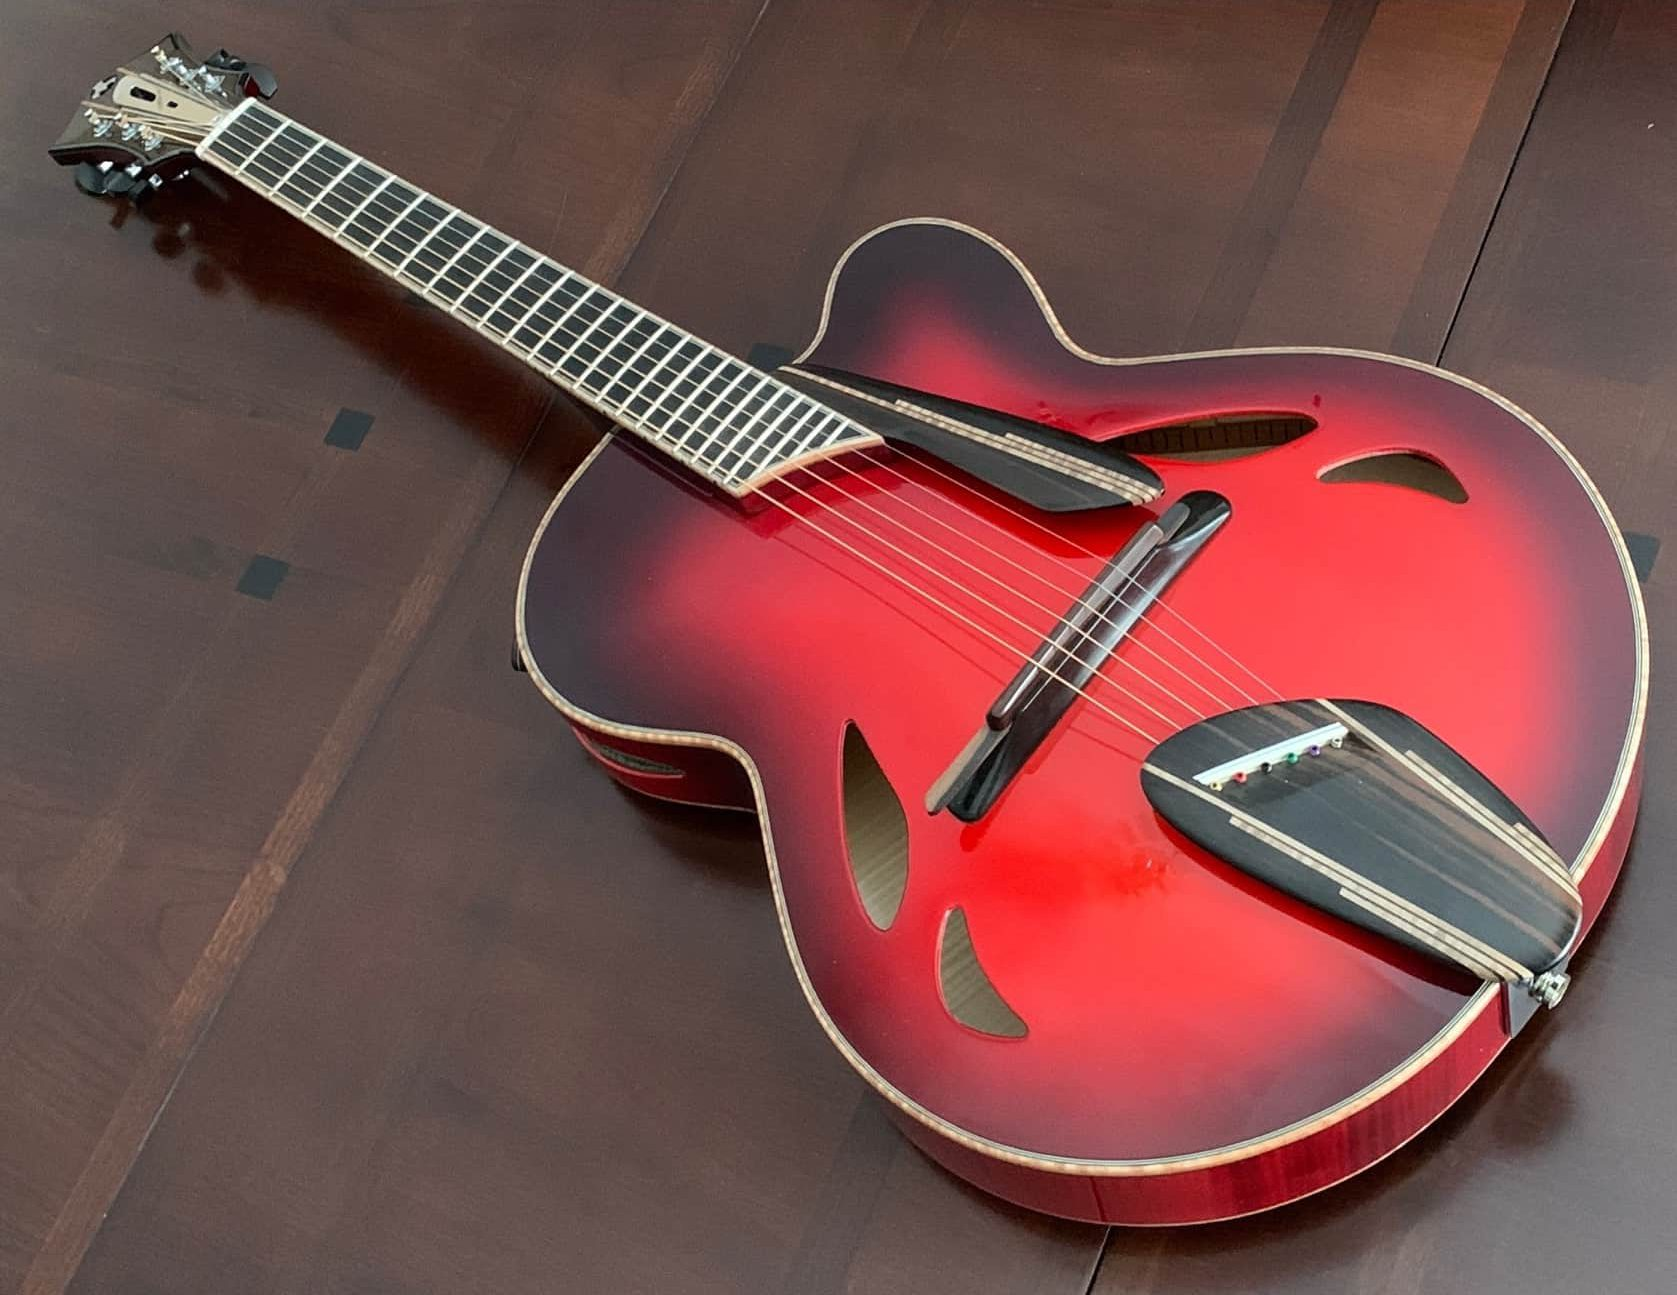 Mirbella Red Crossfire Guitar